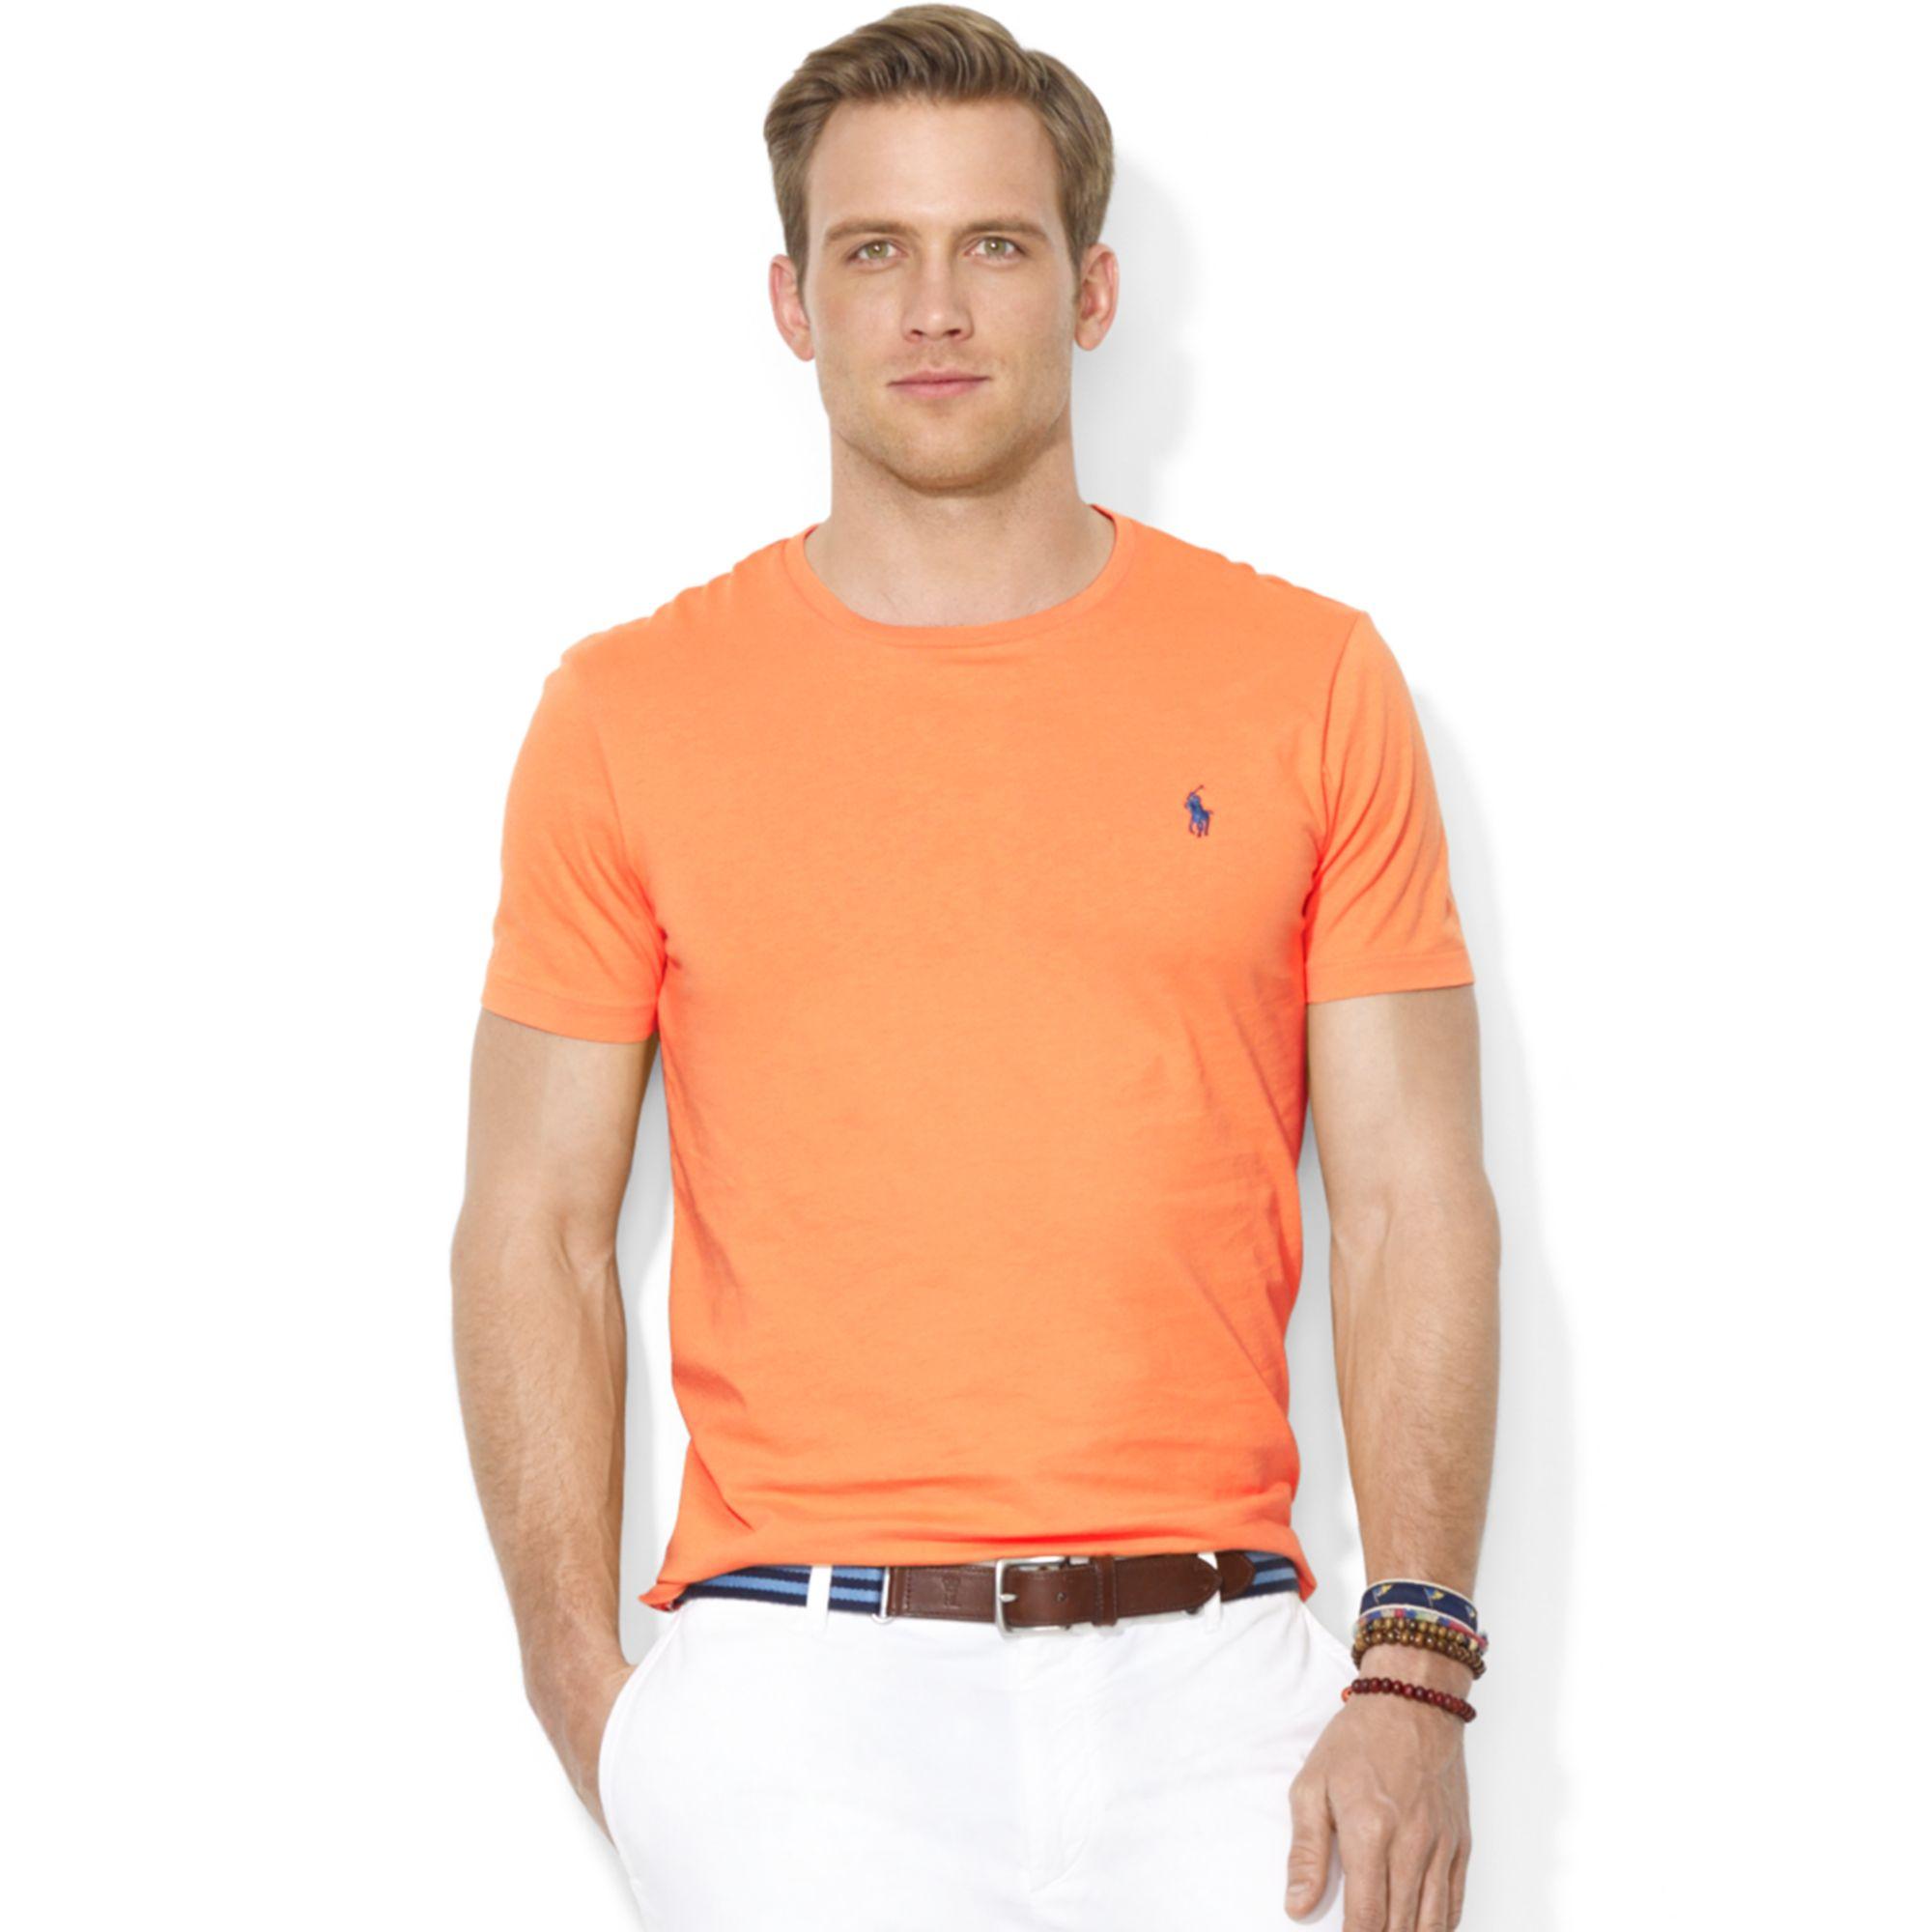 da10ea0d Ralph Lauren Custom Fit Cotton Jersey Crew Neck T-Shirt in Orange ...